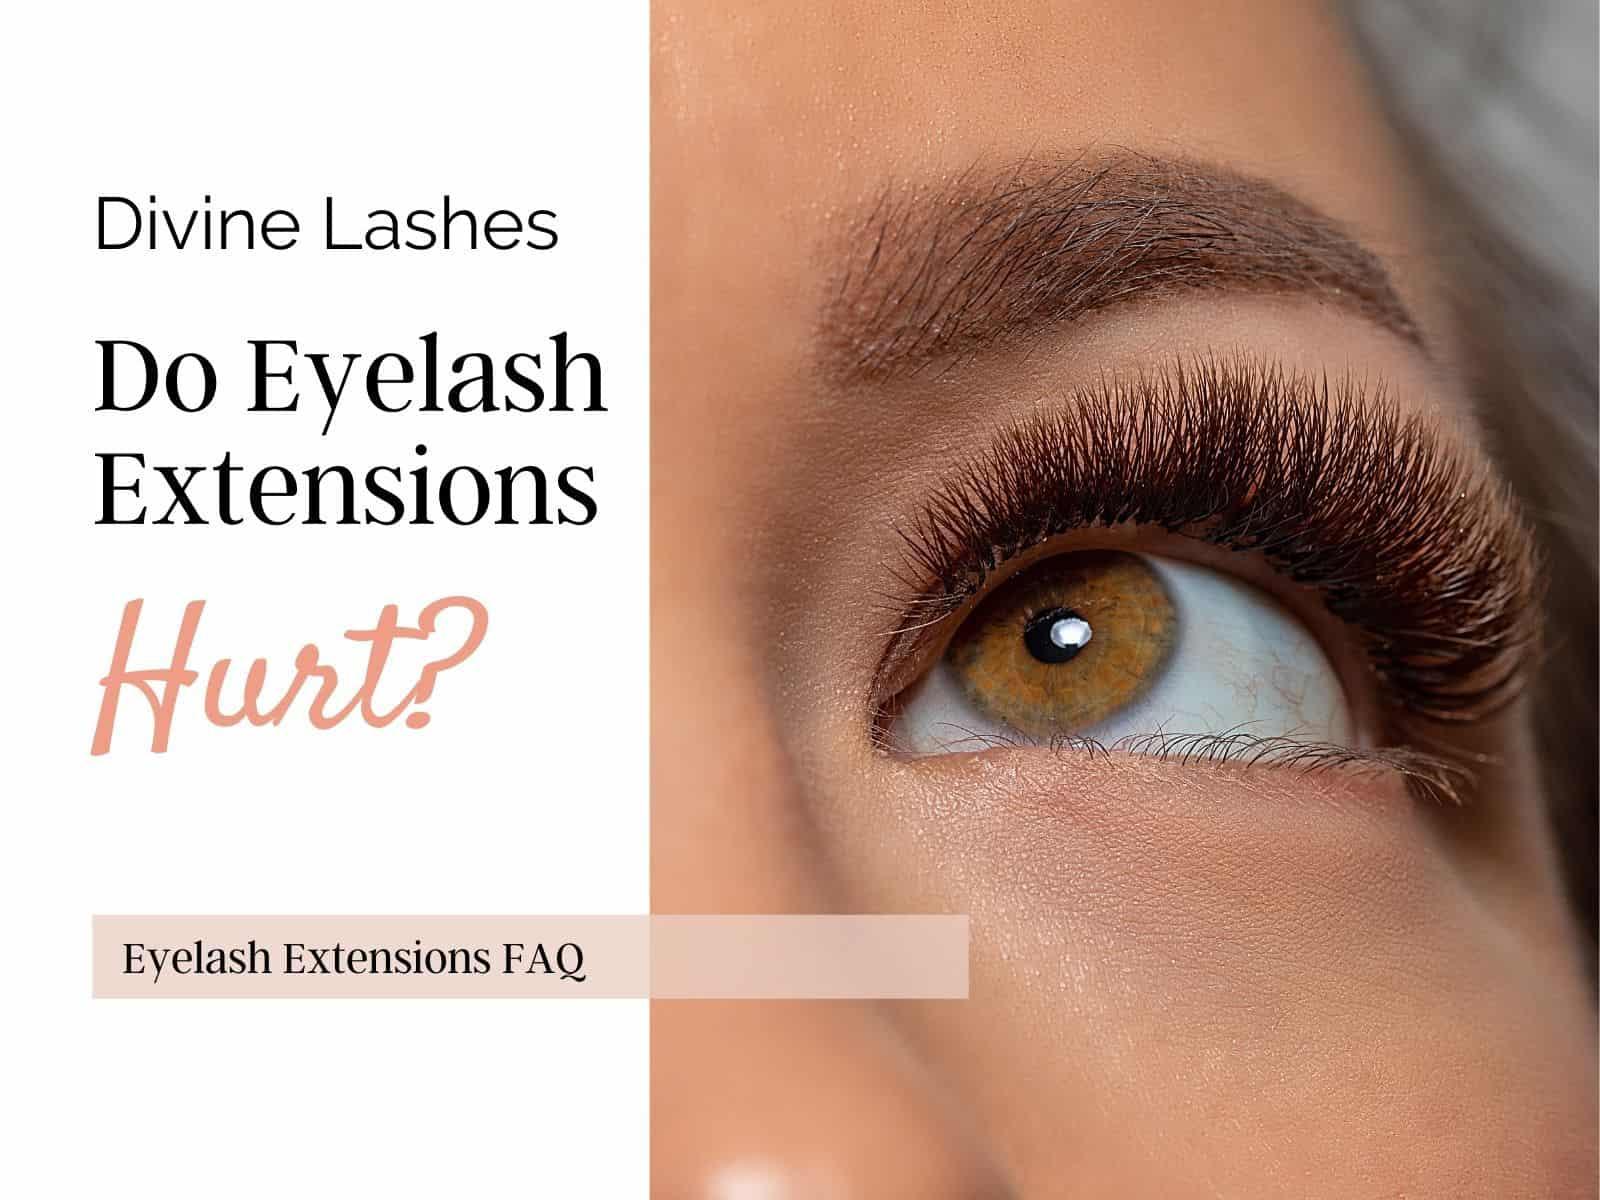 Eyelash extensions FAQ: do eyelash extensions hurt?